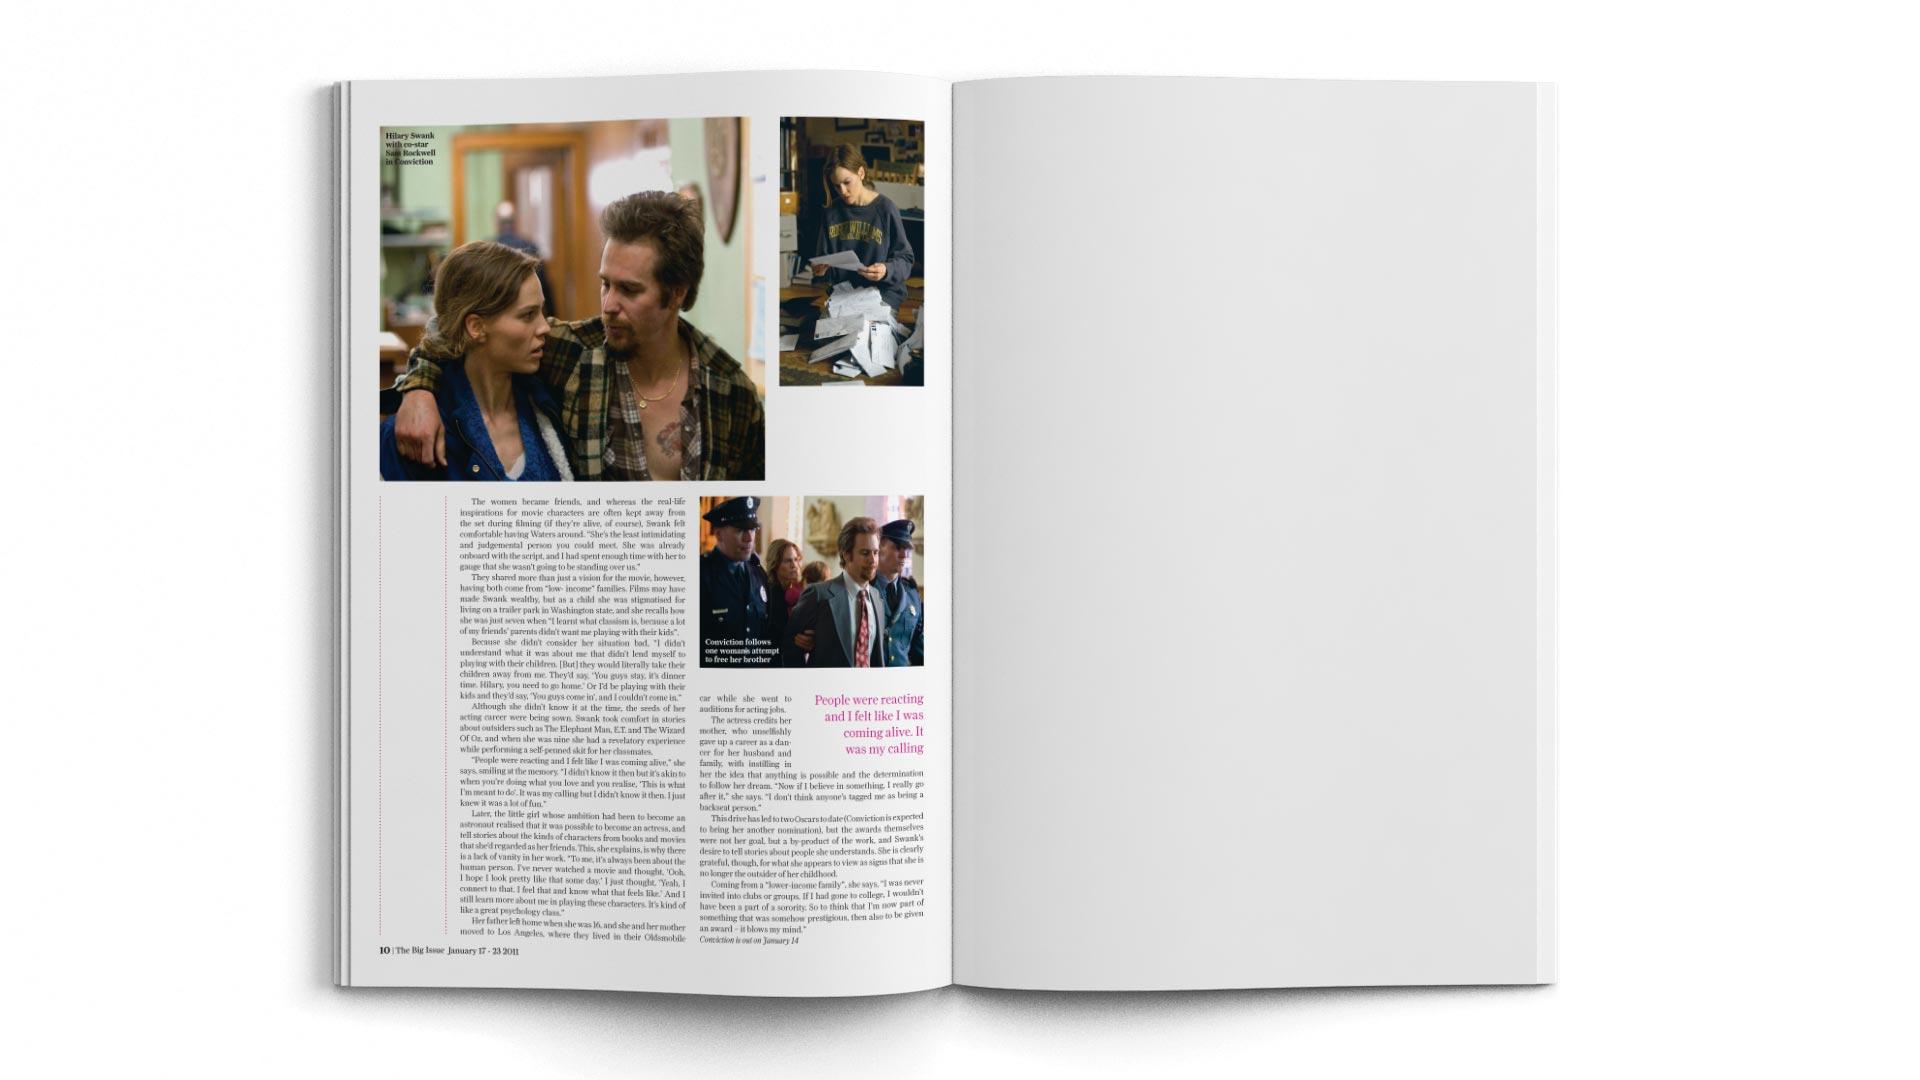 A4-Magazine-DPS-TBI-Hilary-Swank-2